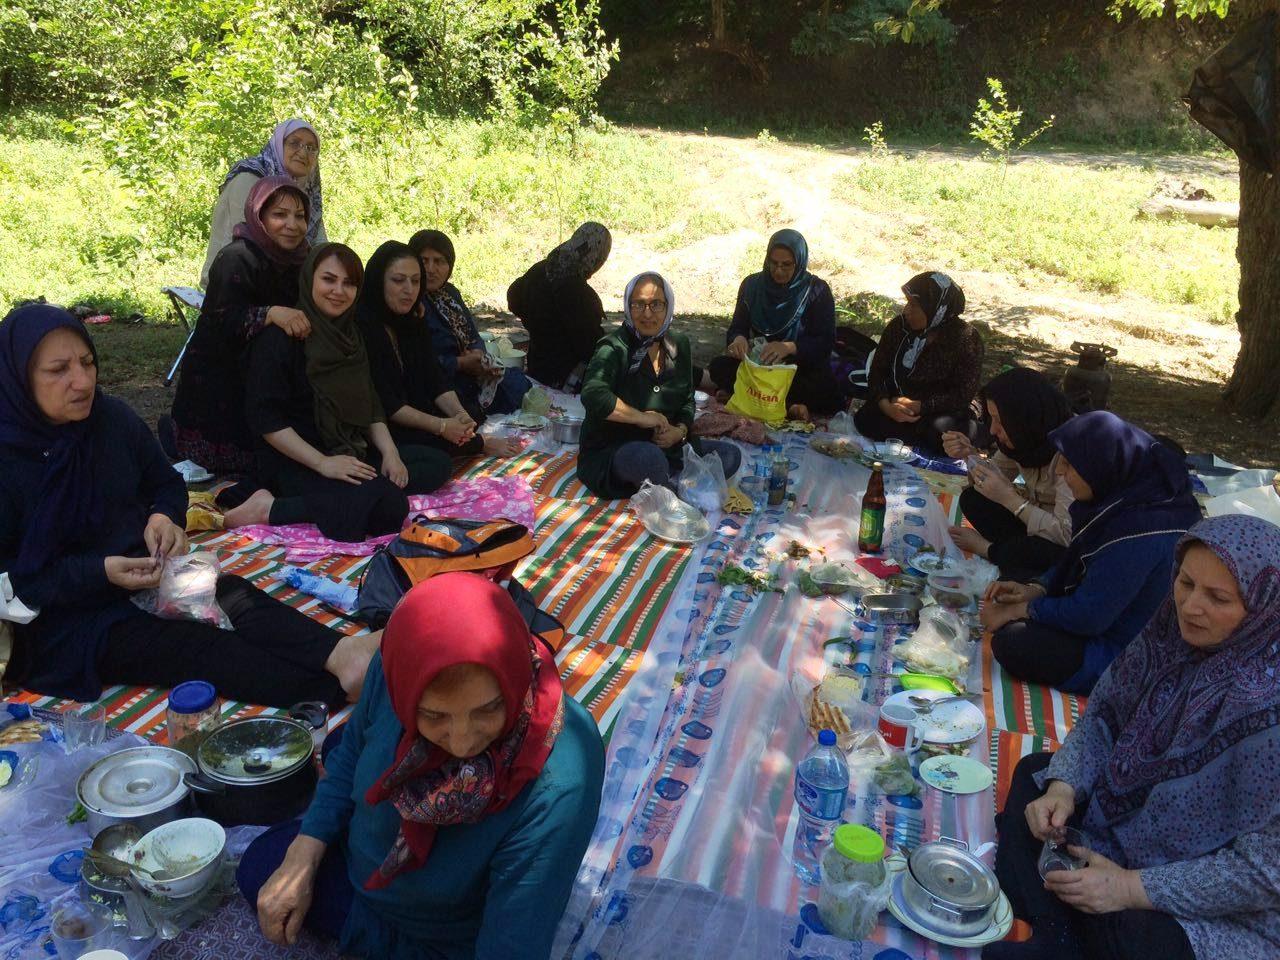 اردوی جنگل نشینی در  مازندران   منطقه چورت کیاسر